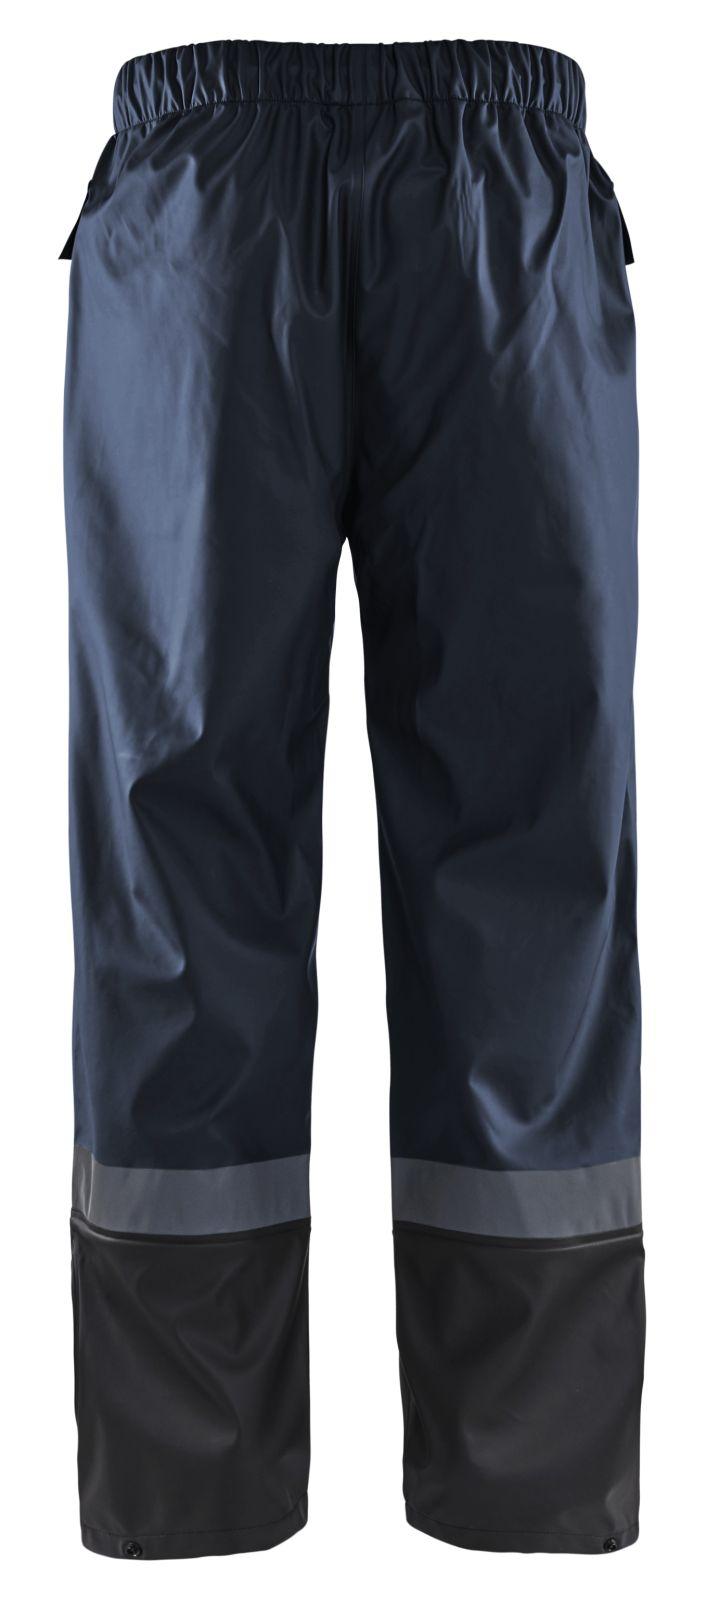 Blaklader Broeken 13222003 donker marineblauw-zwart(8699)